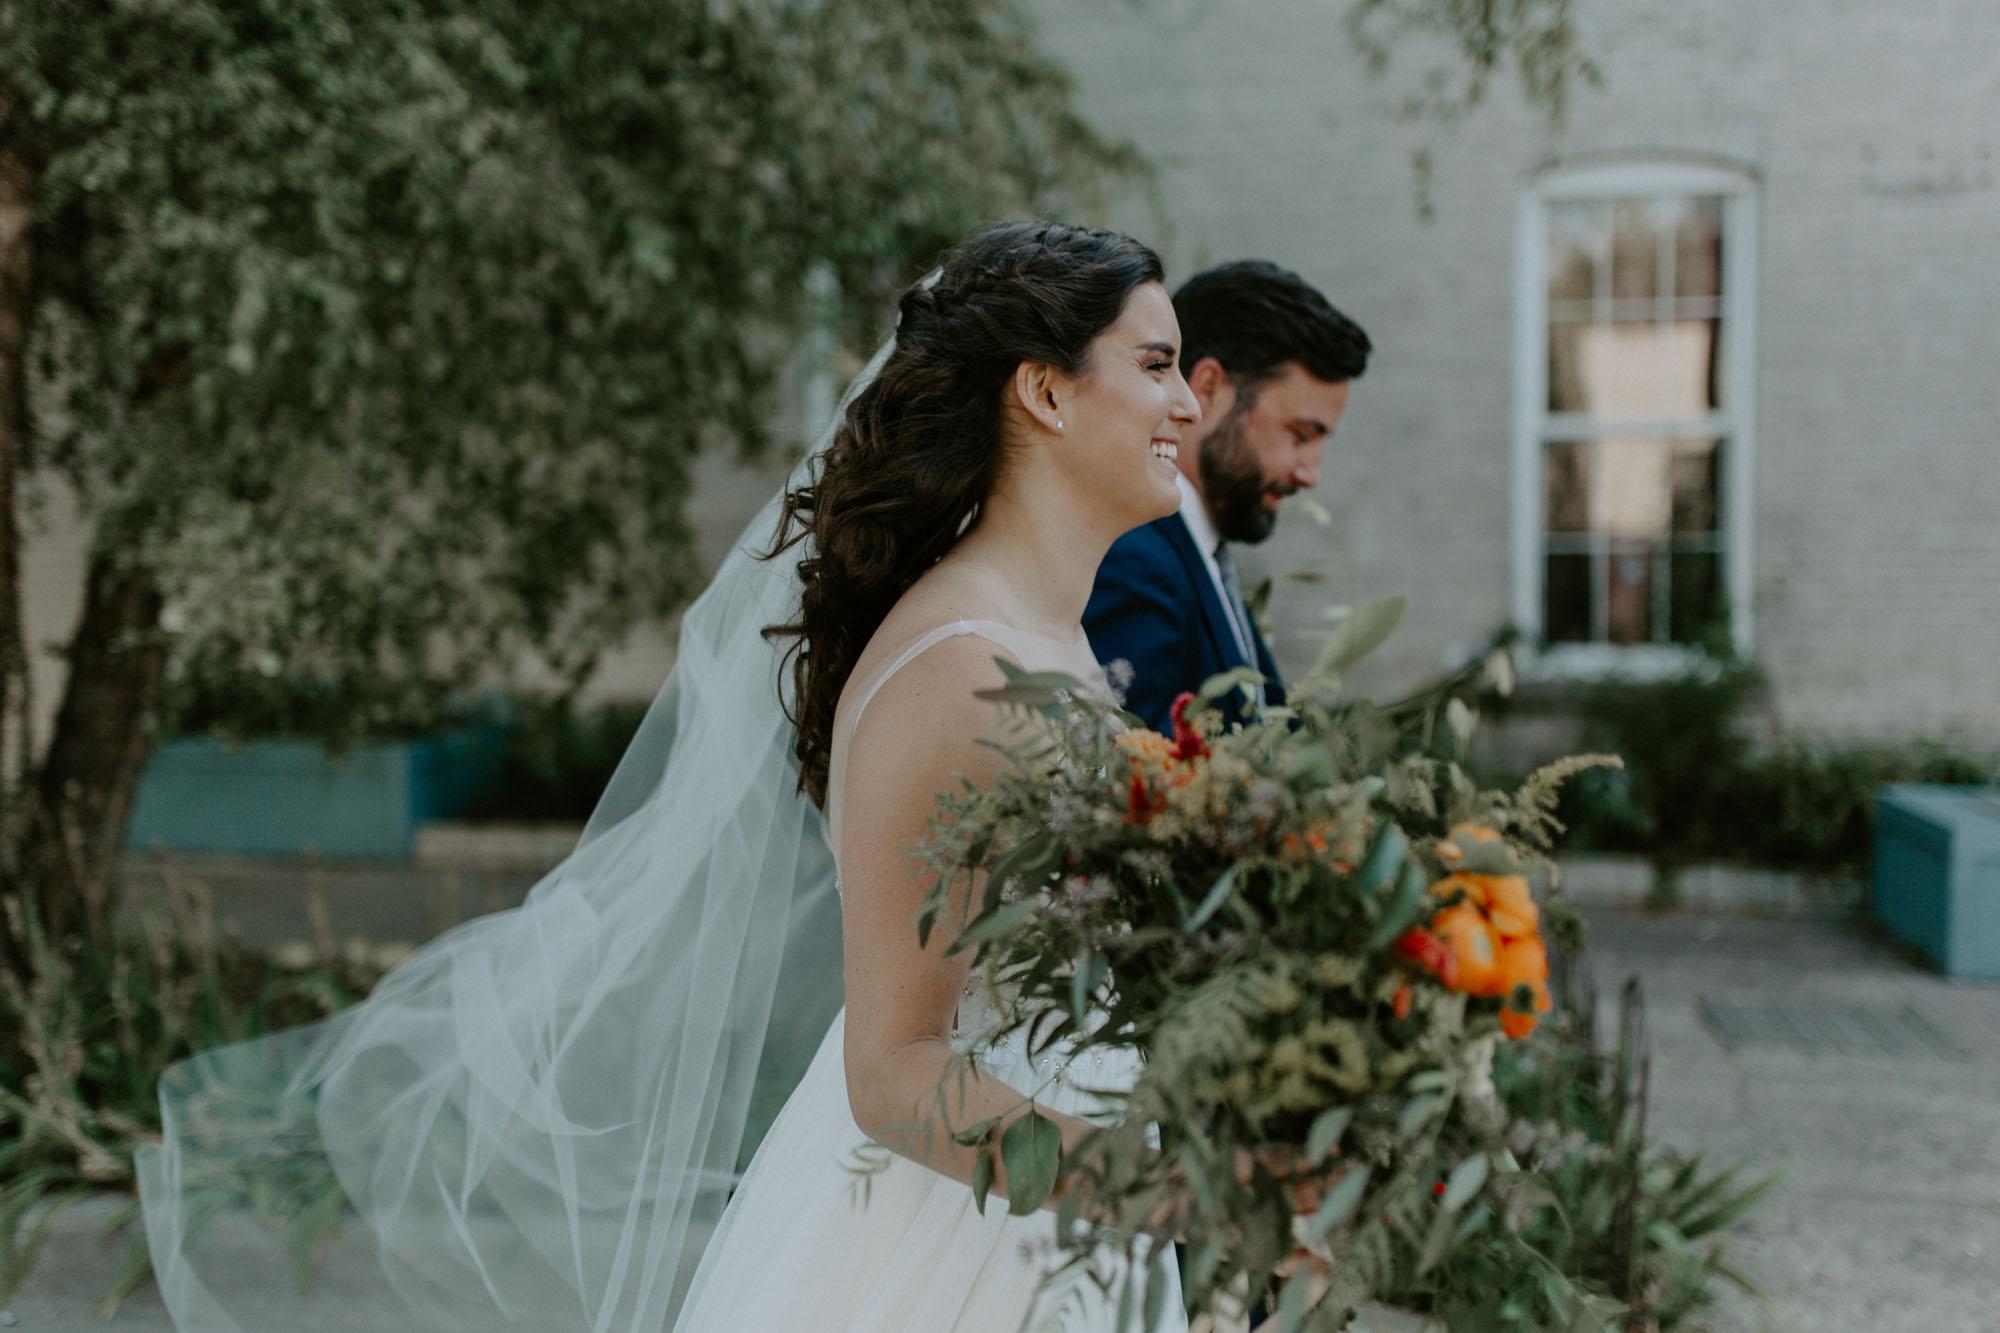 journeyman_distillery_wedding_photographer_chicago_il_wright_photographs-4037.jpg